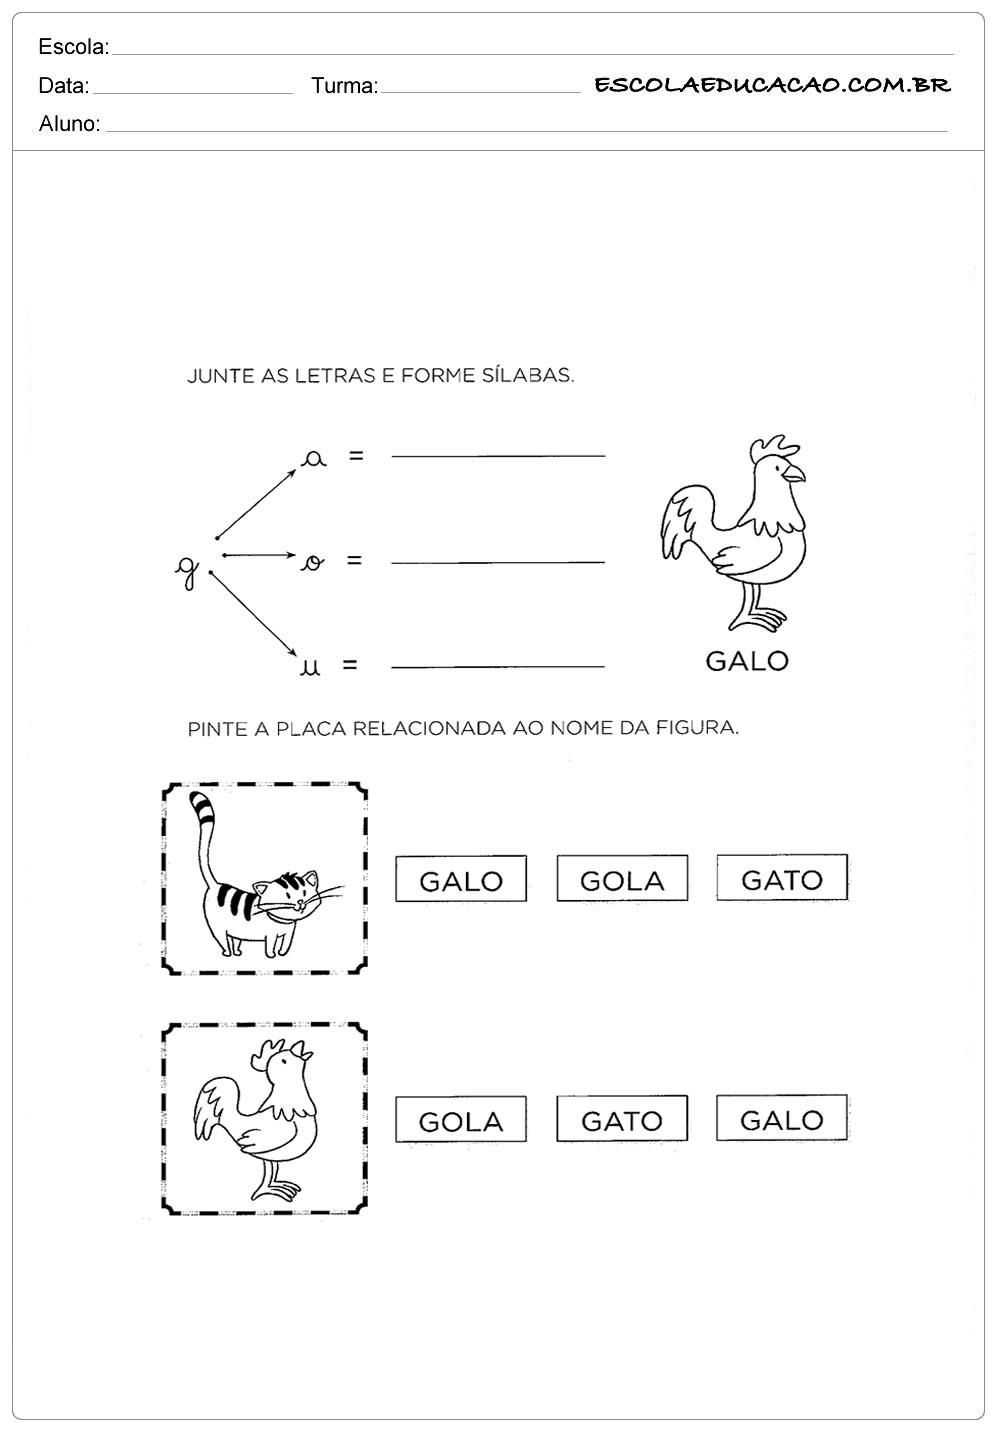 Atividades com a Letra G - Junte as Letras